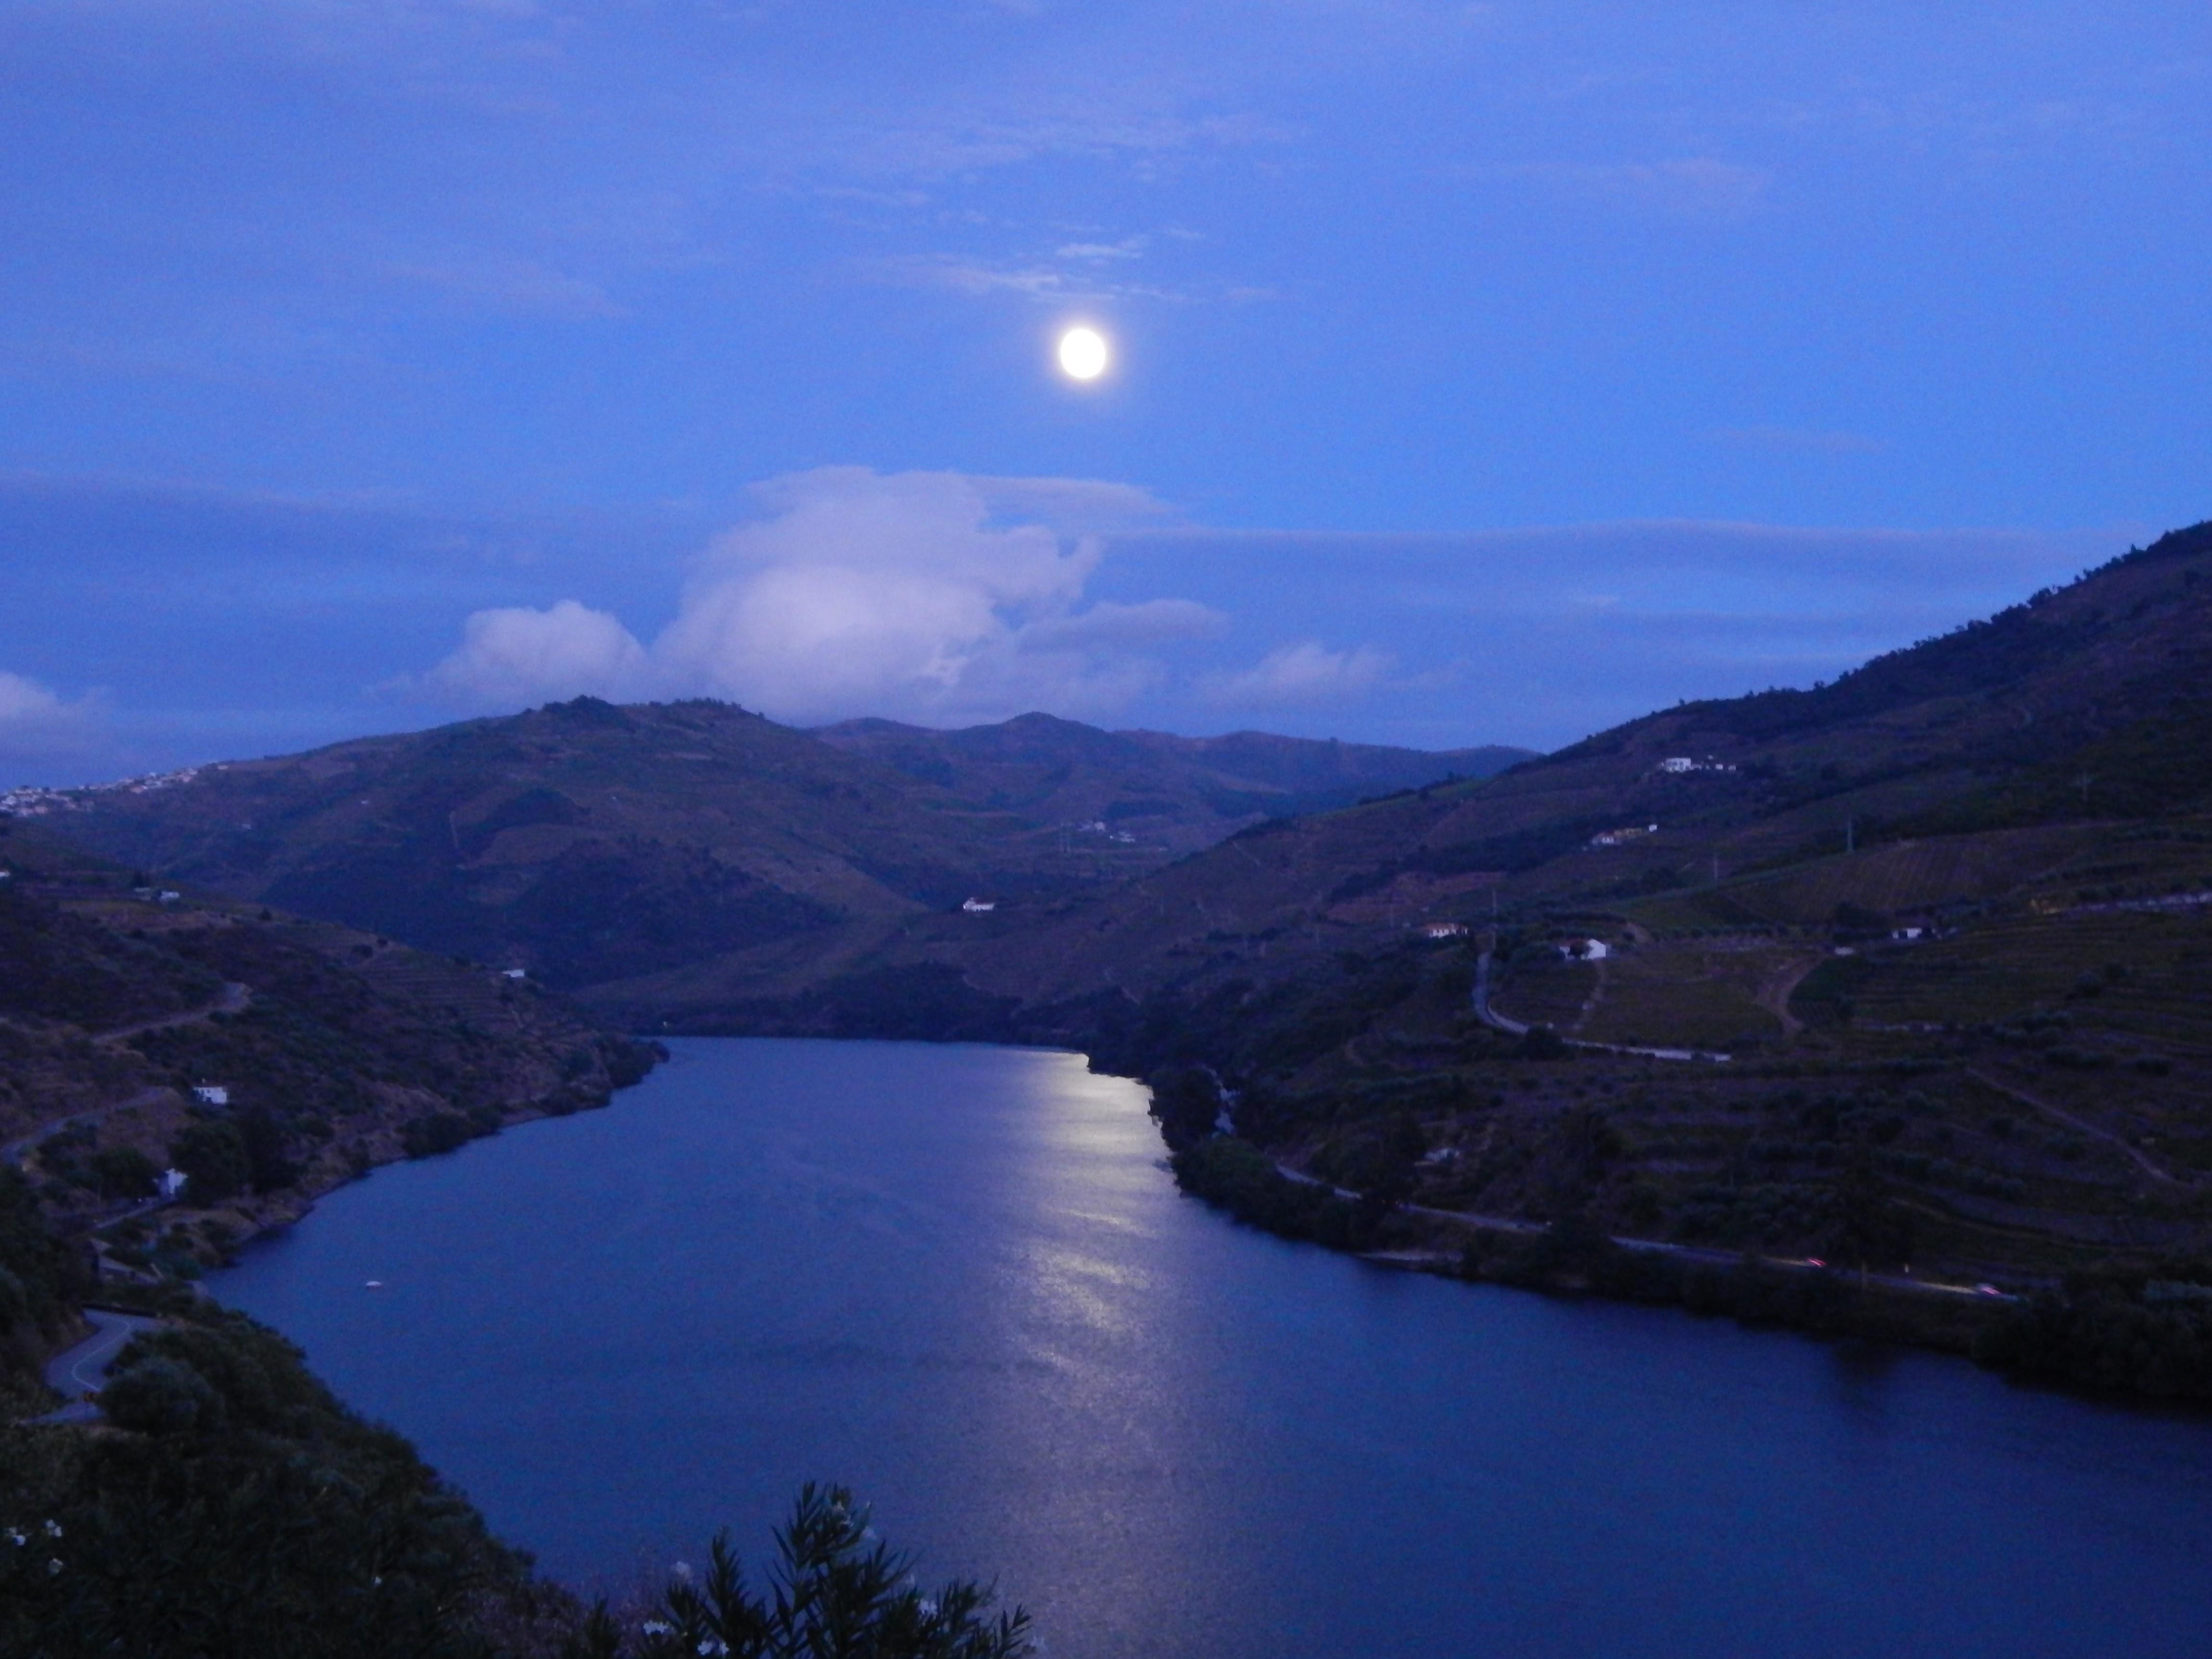 Full Moon over Douro